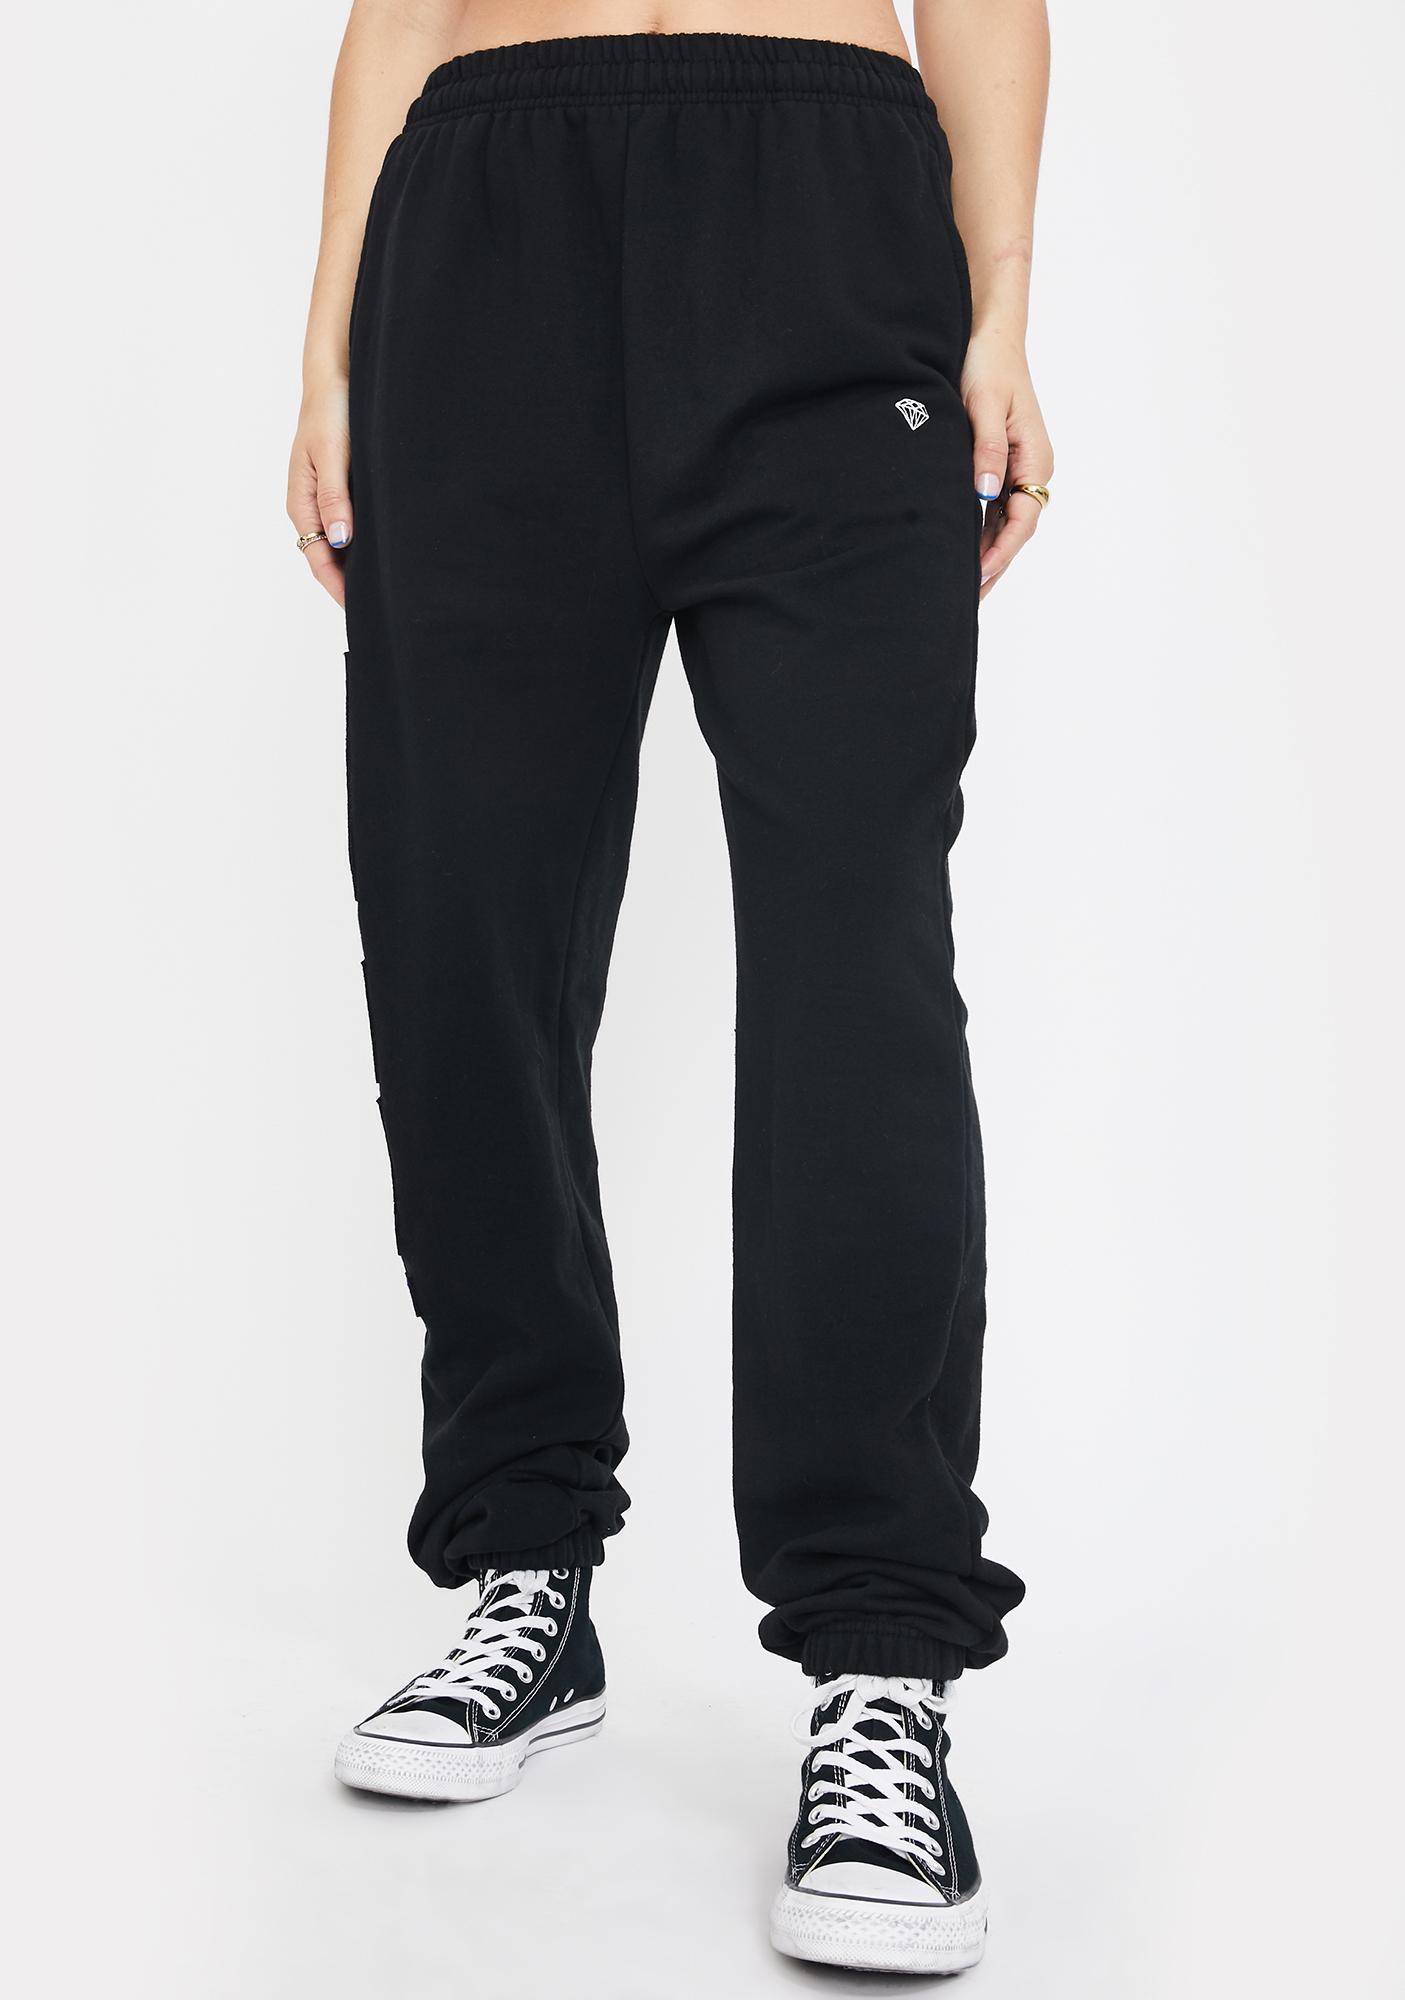 Diamond Supply Co X Cam'ron Purple Haze Sweatpants